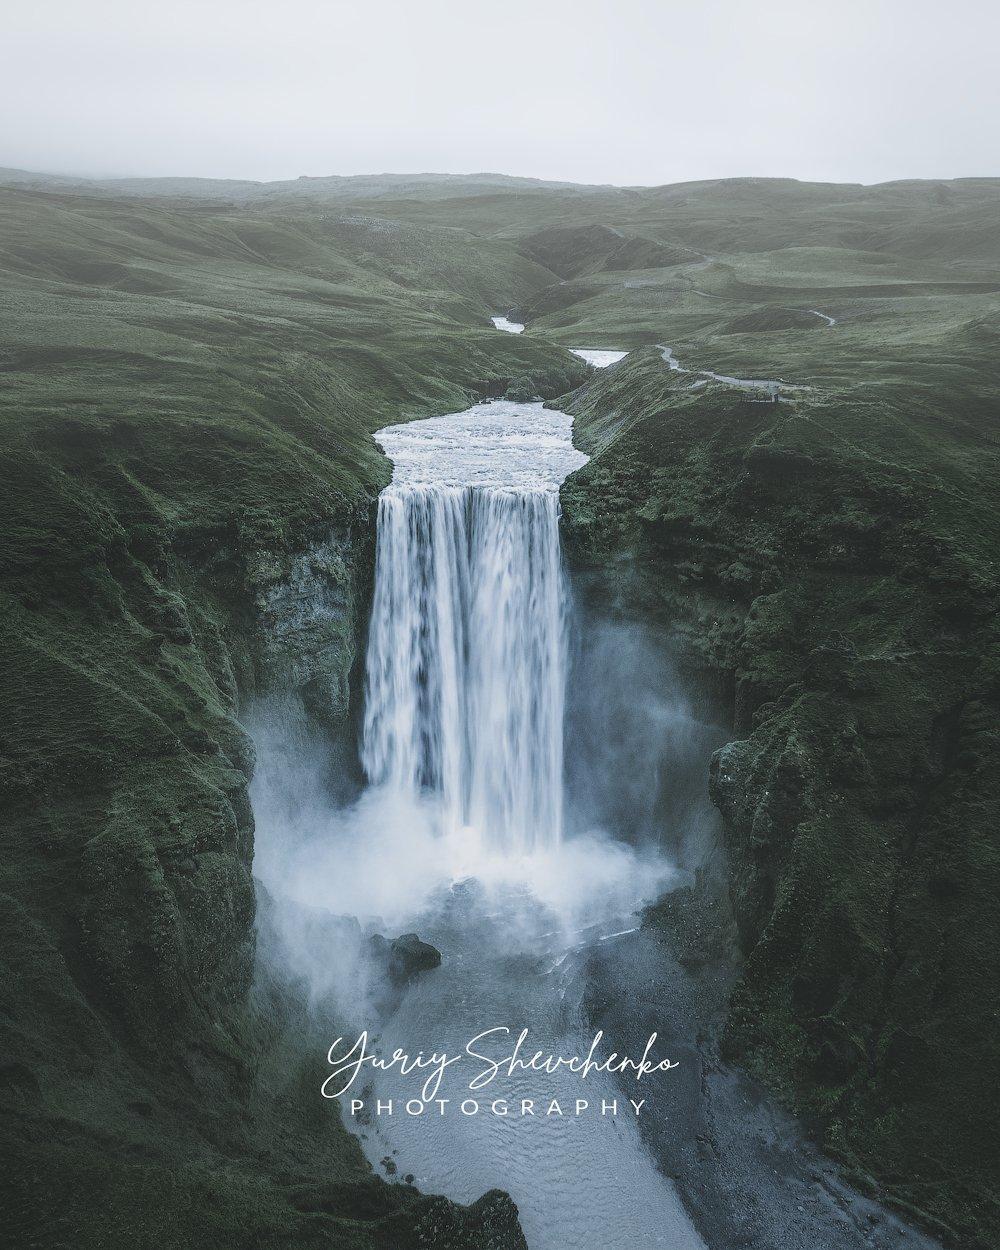 iceland, исландия, skógafoss, скогафосс, Шевченко Юрий (Phototours.pro)